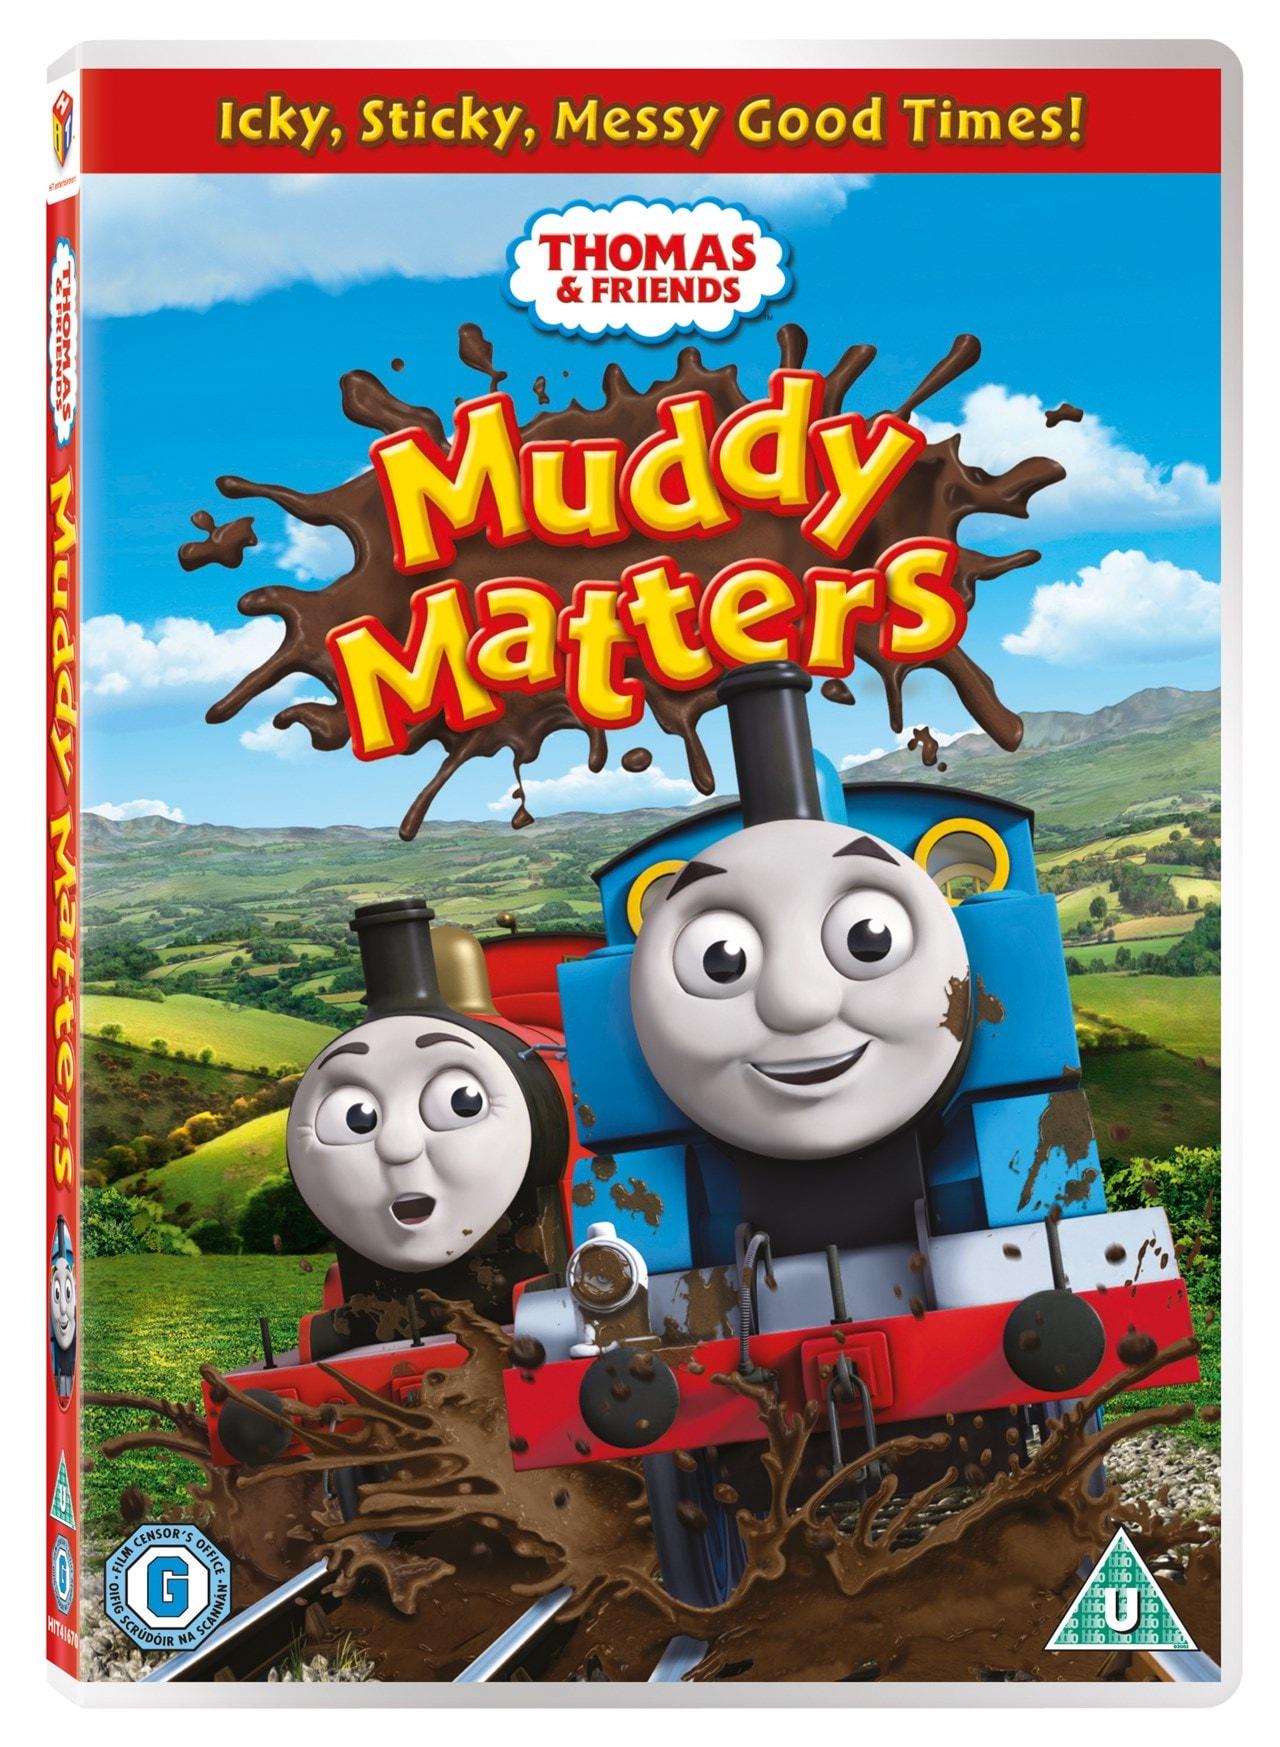 Thomas & Friends: Muddy Waters - 2